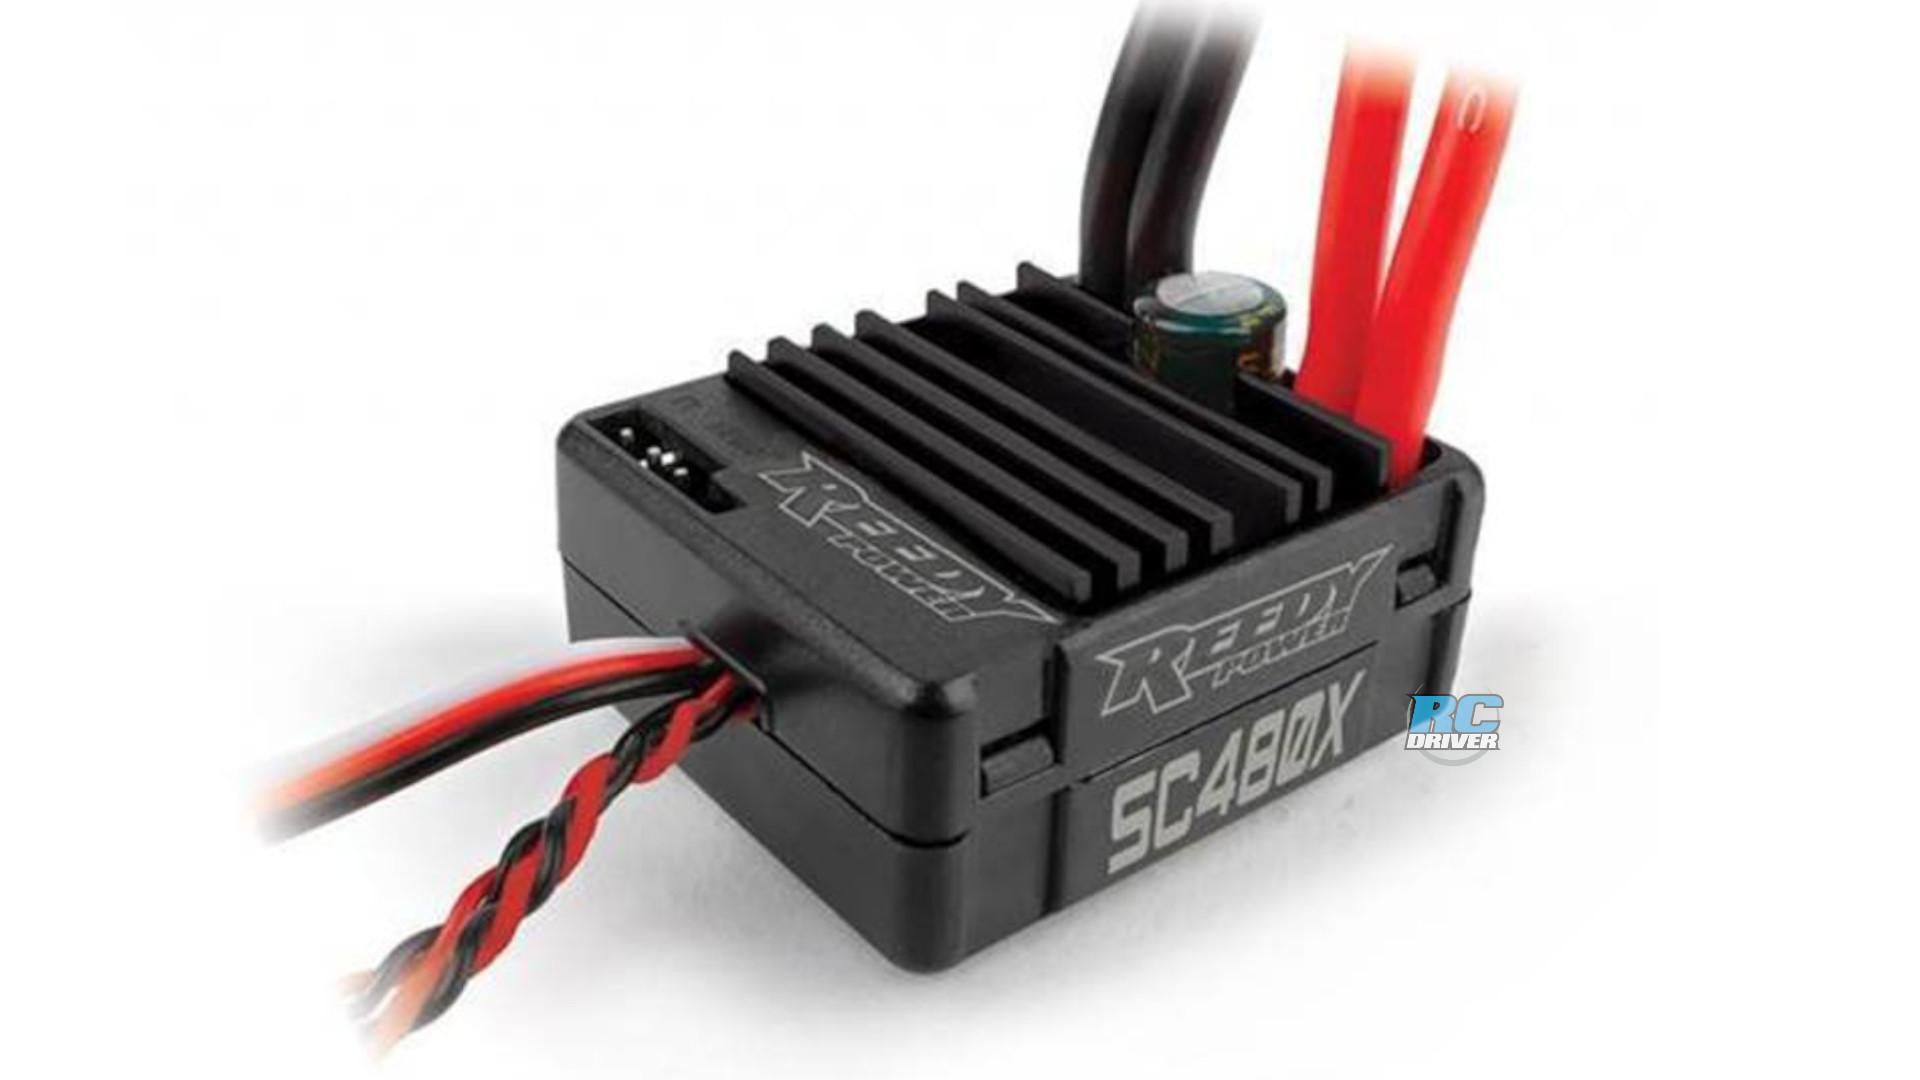 Reedy SC480X Brushed Crawler ESC - announced